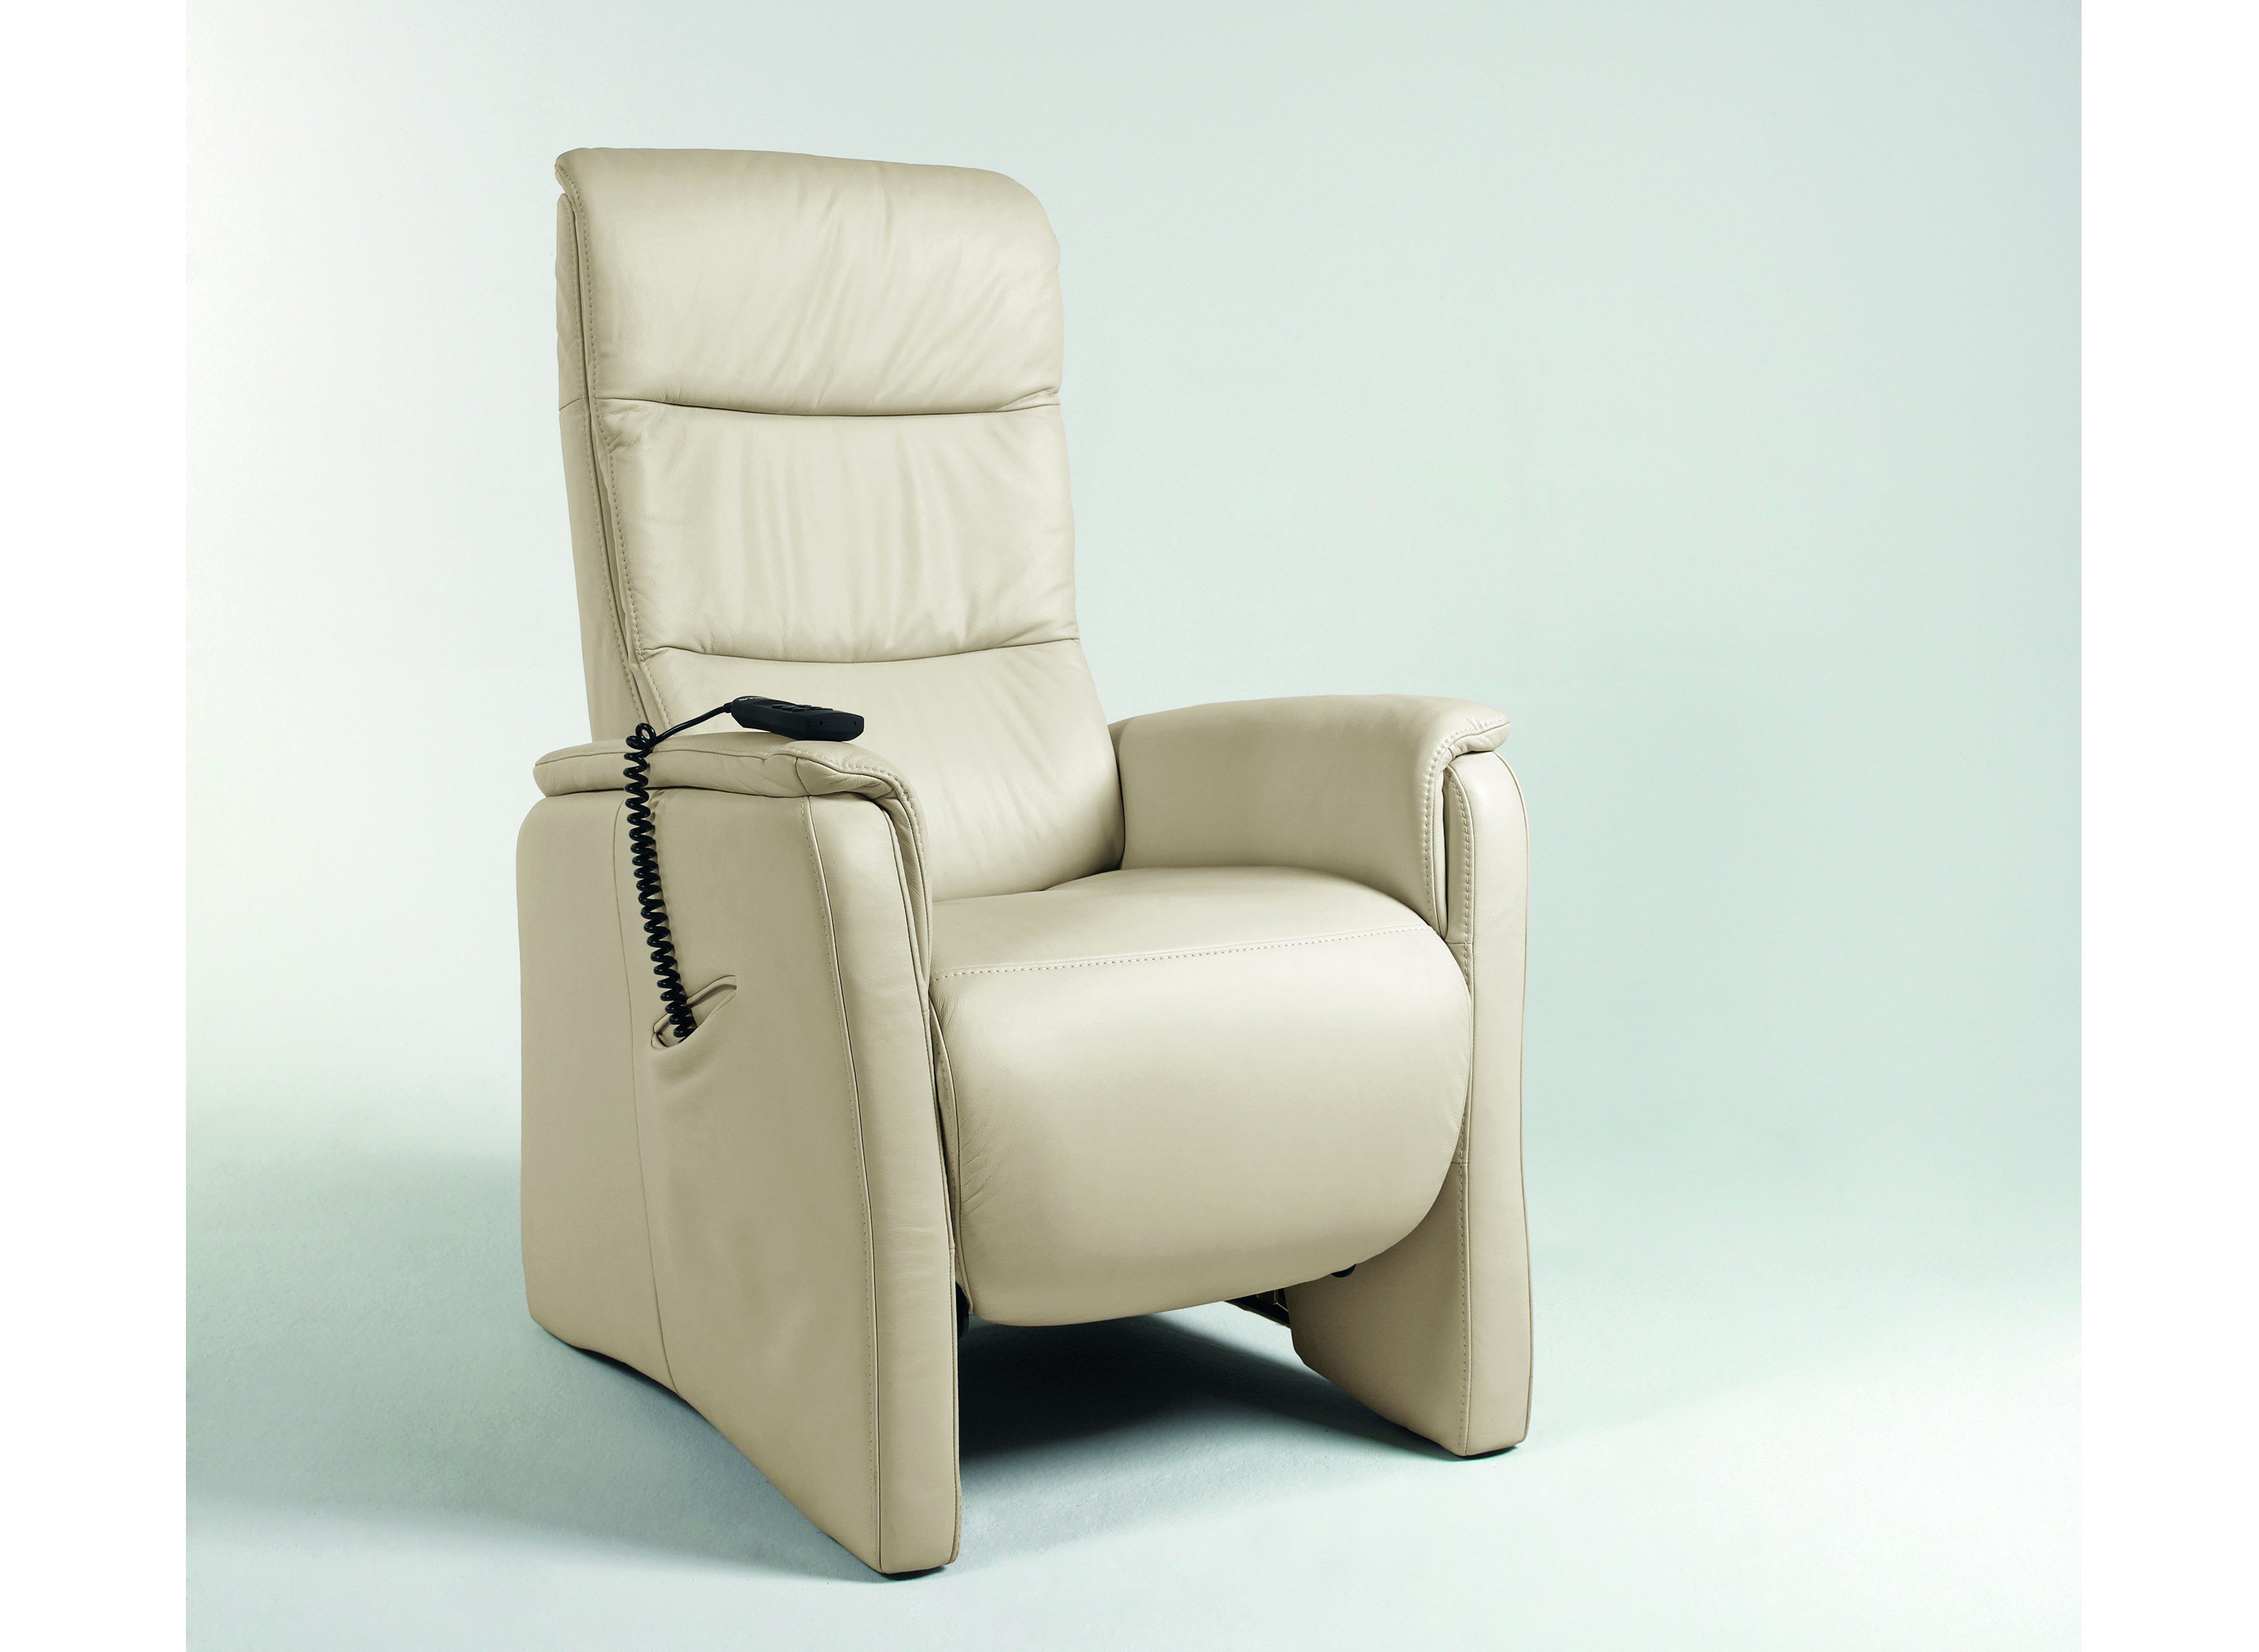 bali schlafsofa messina preisvergleich 3 seat sofa slipcover hukla relaxsessel williamflooring